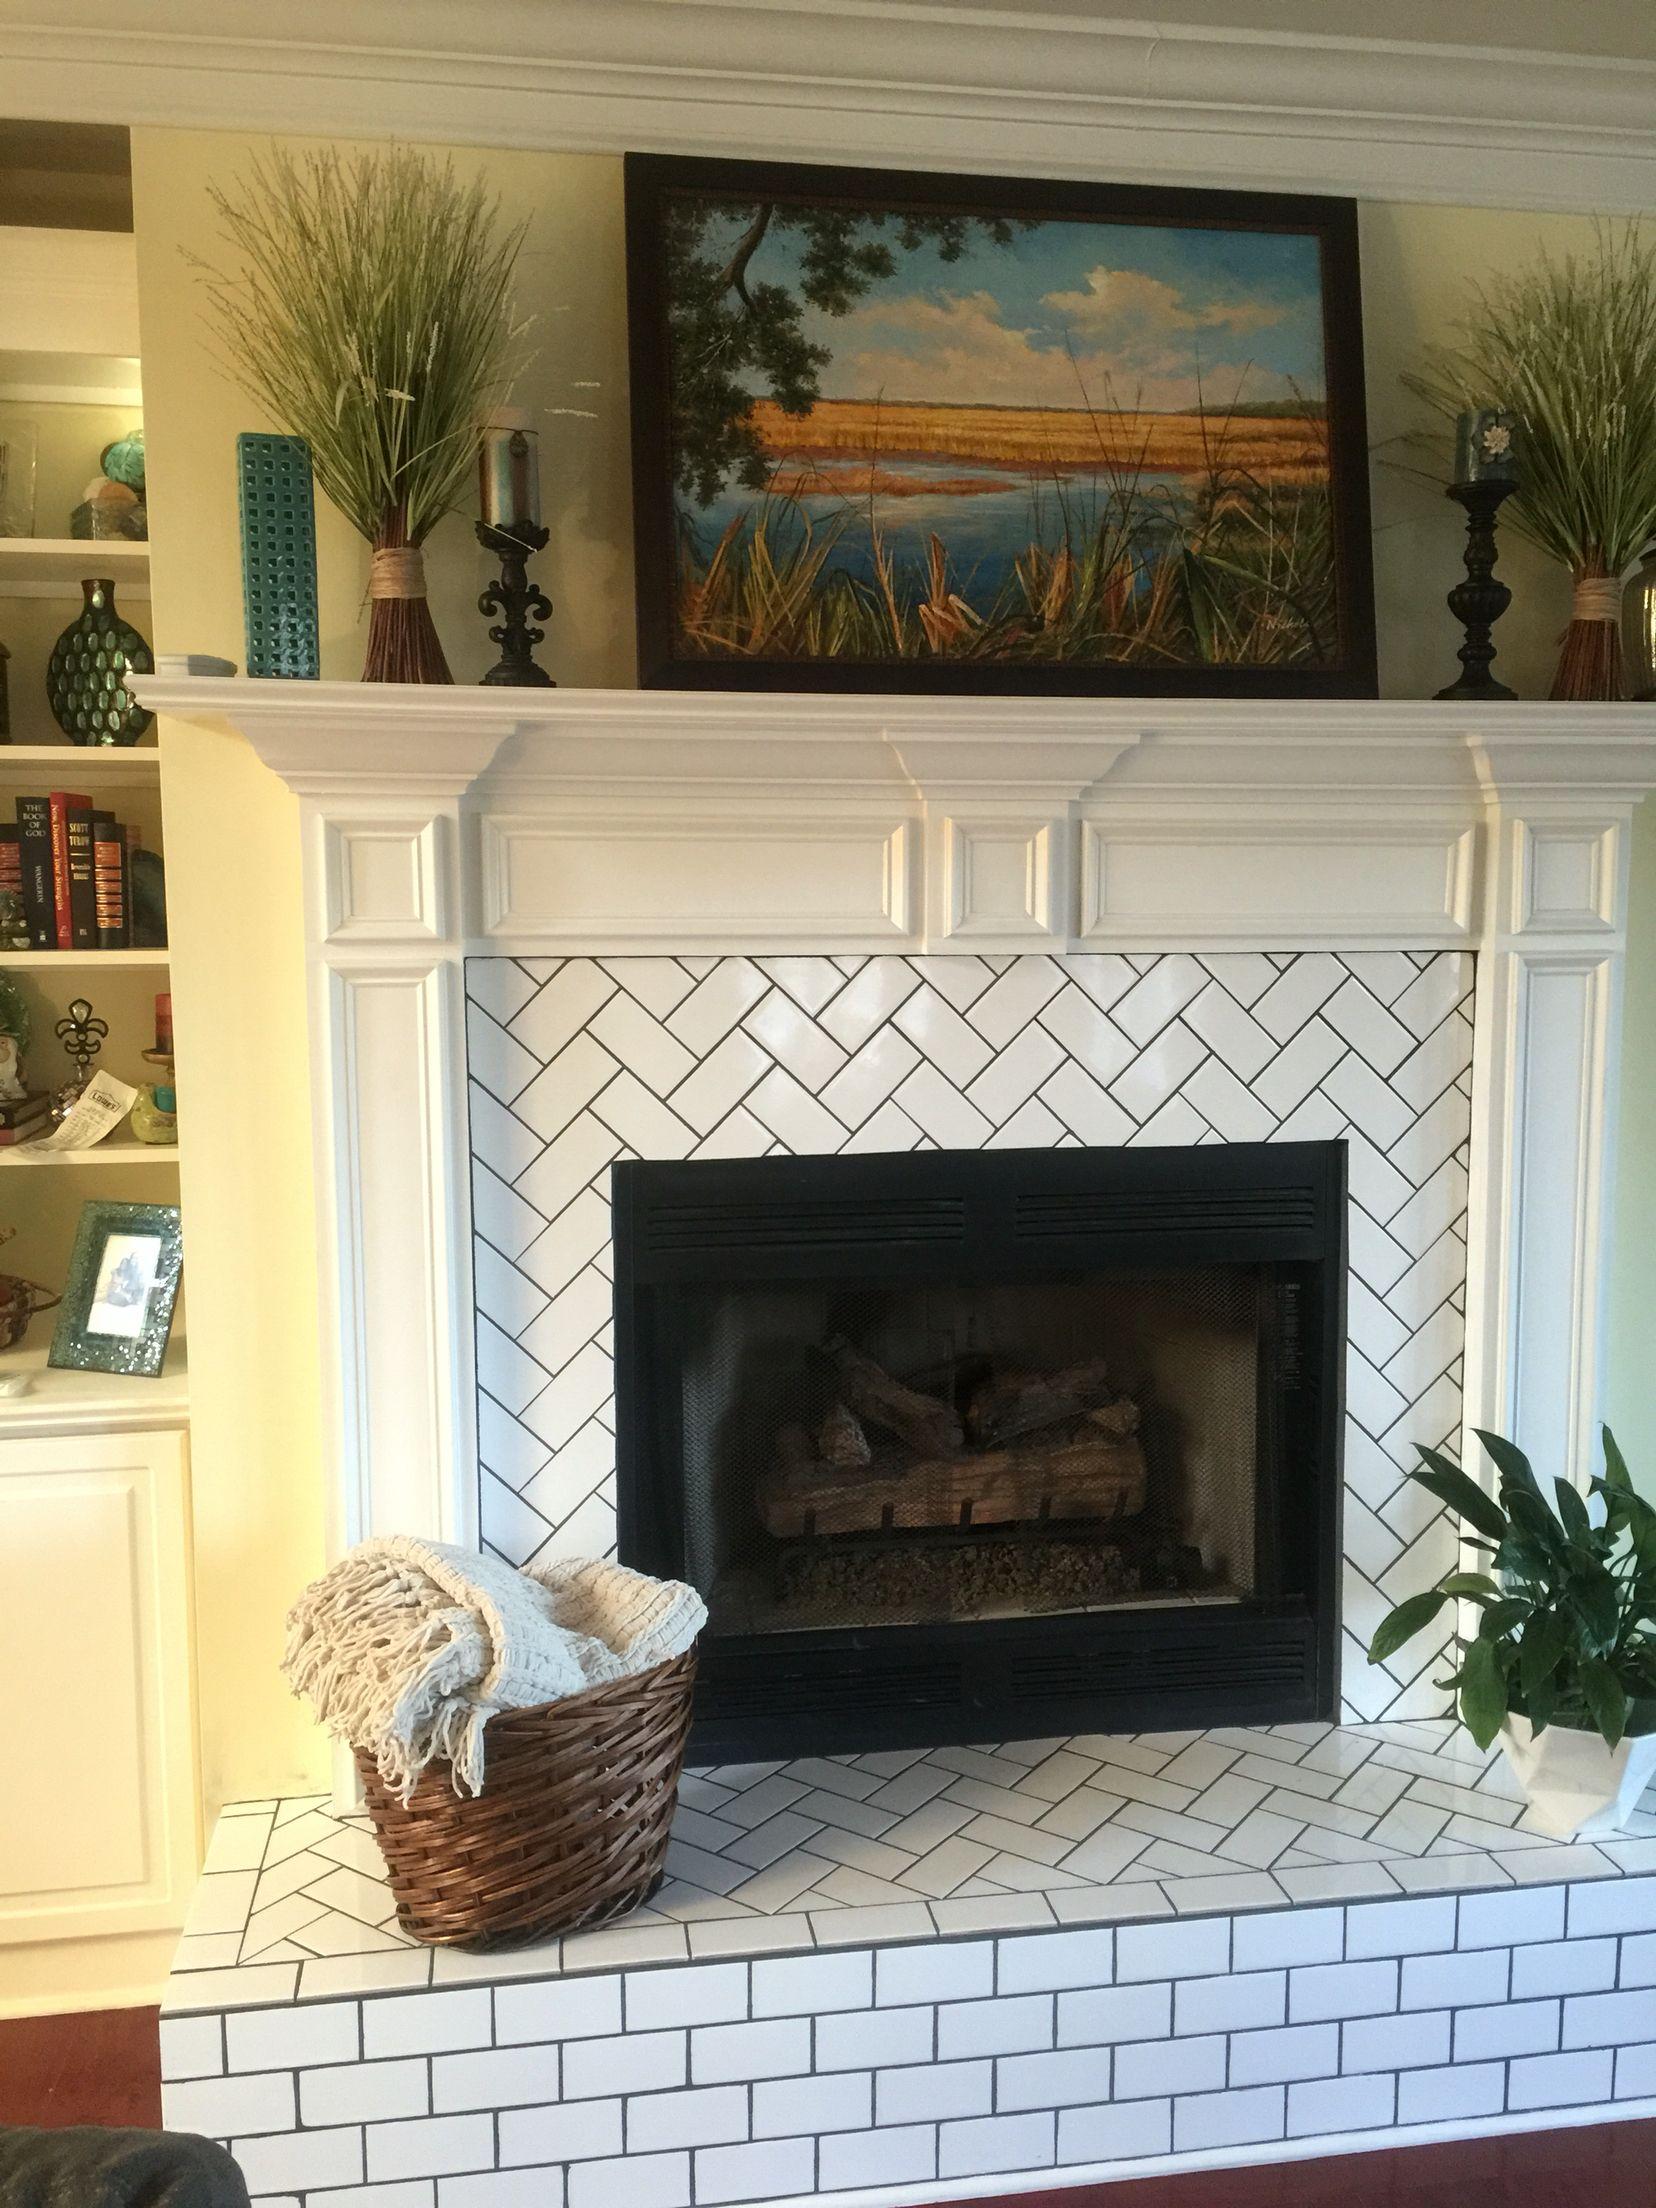 Herringbone Pattern Subway Tile Fireplace Hearth And Surround